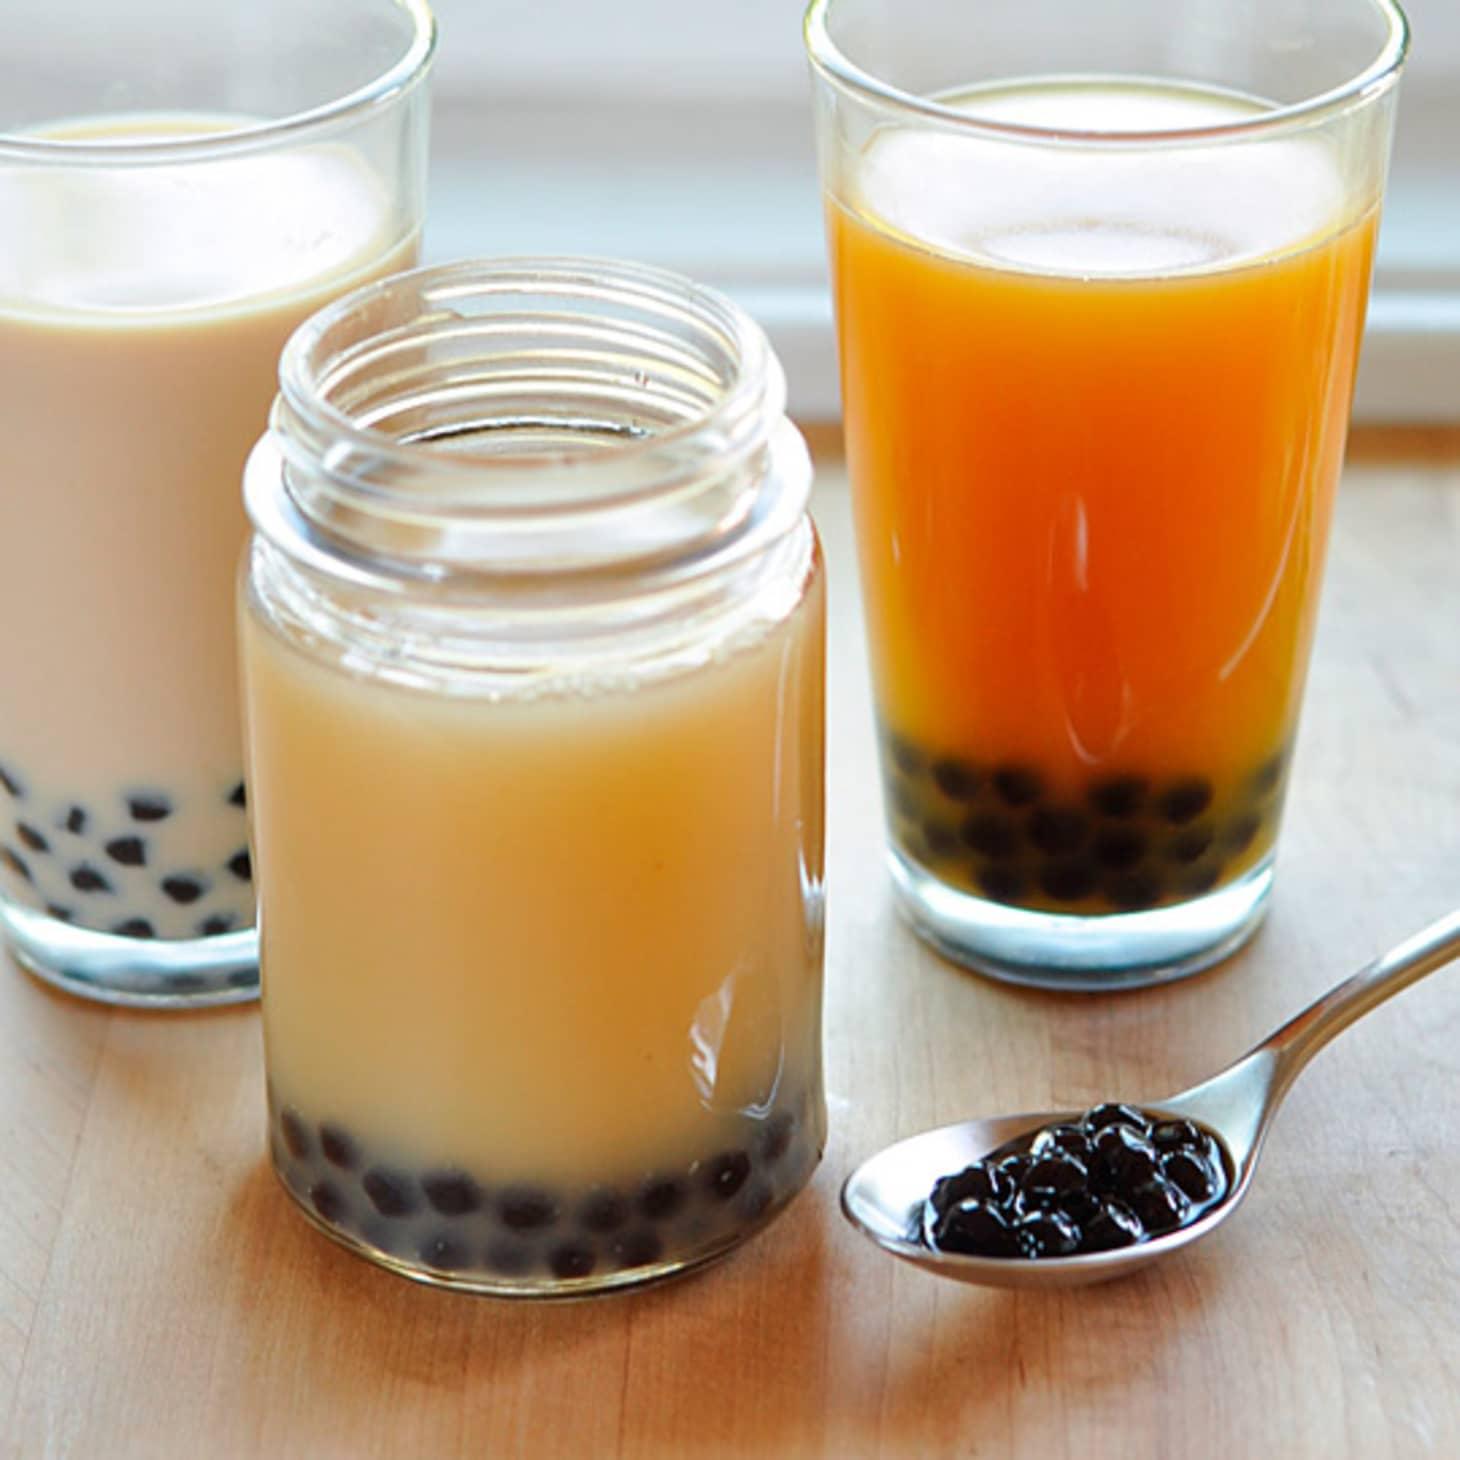 How To Make Boba & Bubble Tea